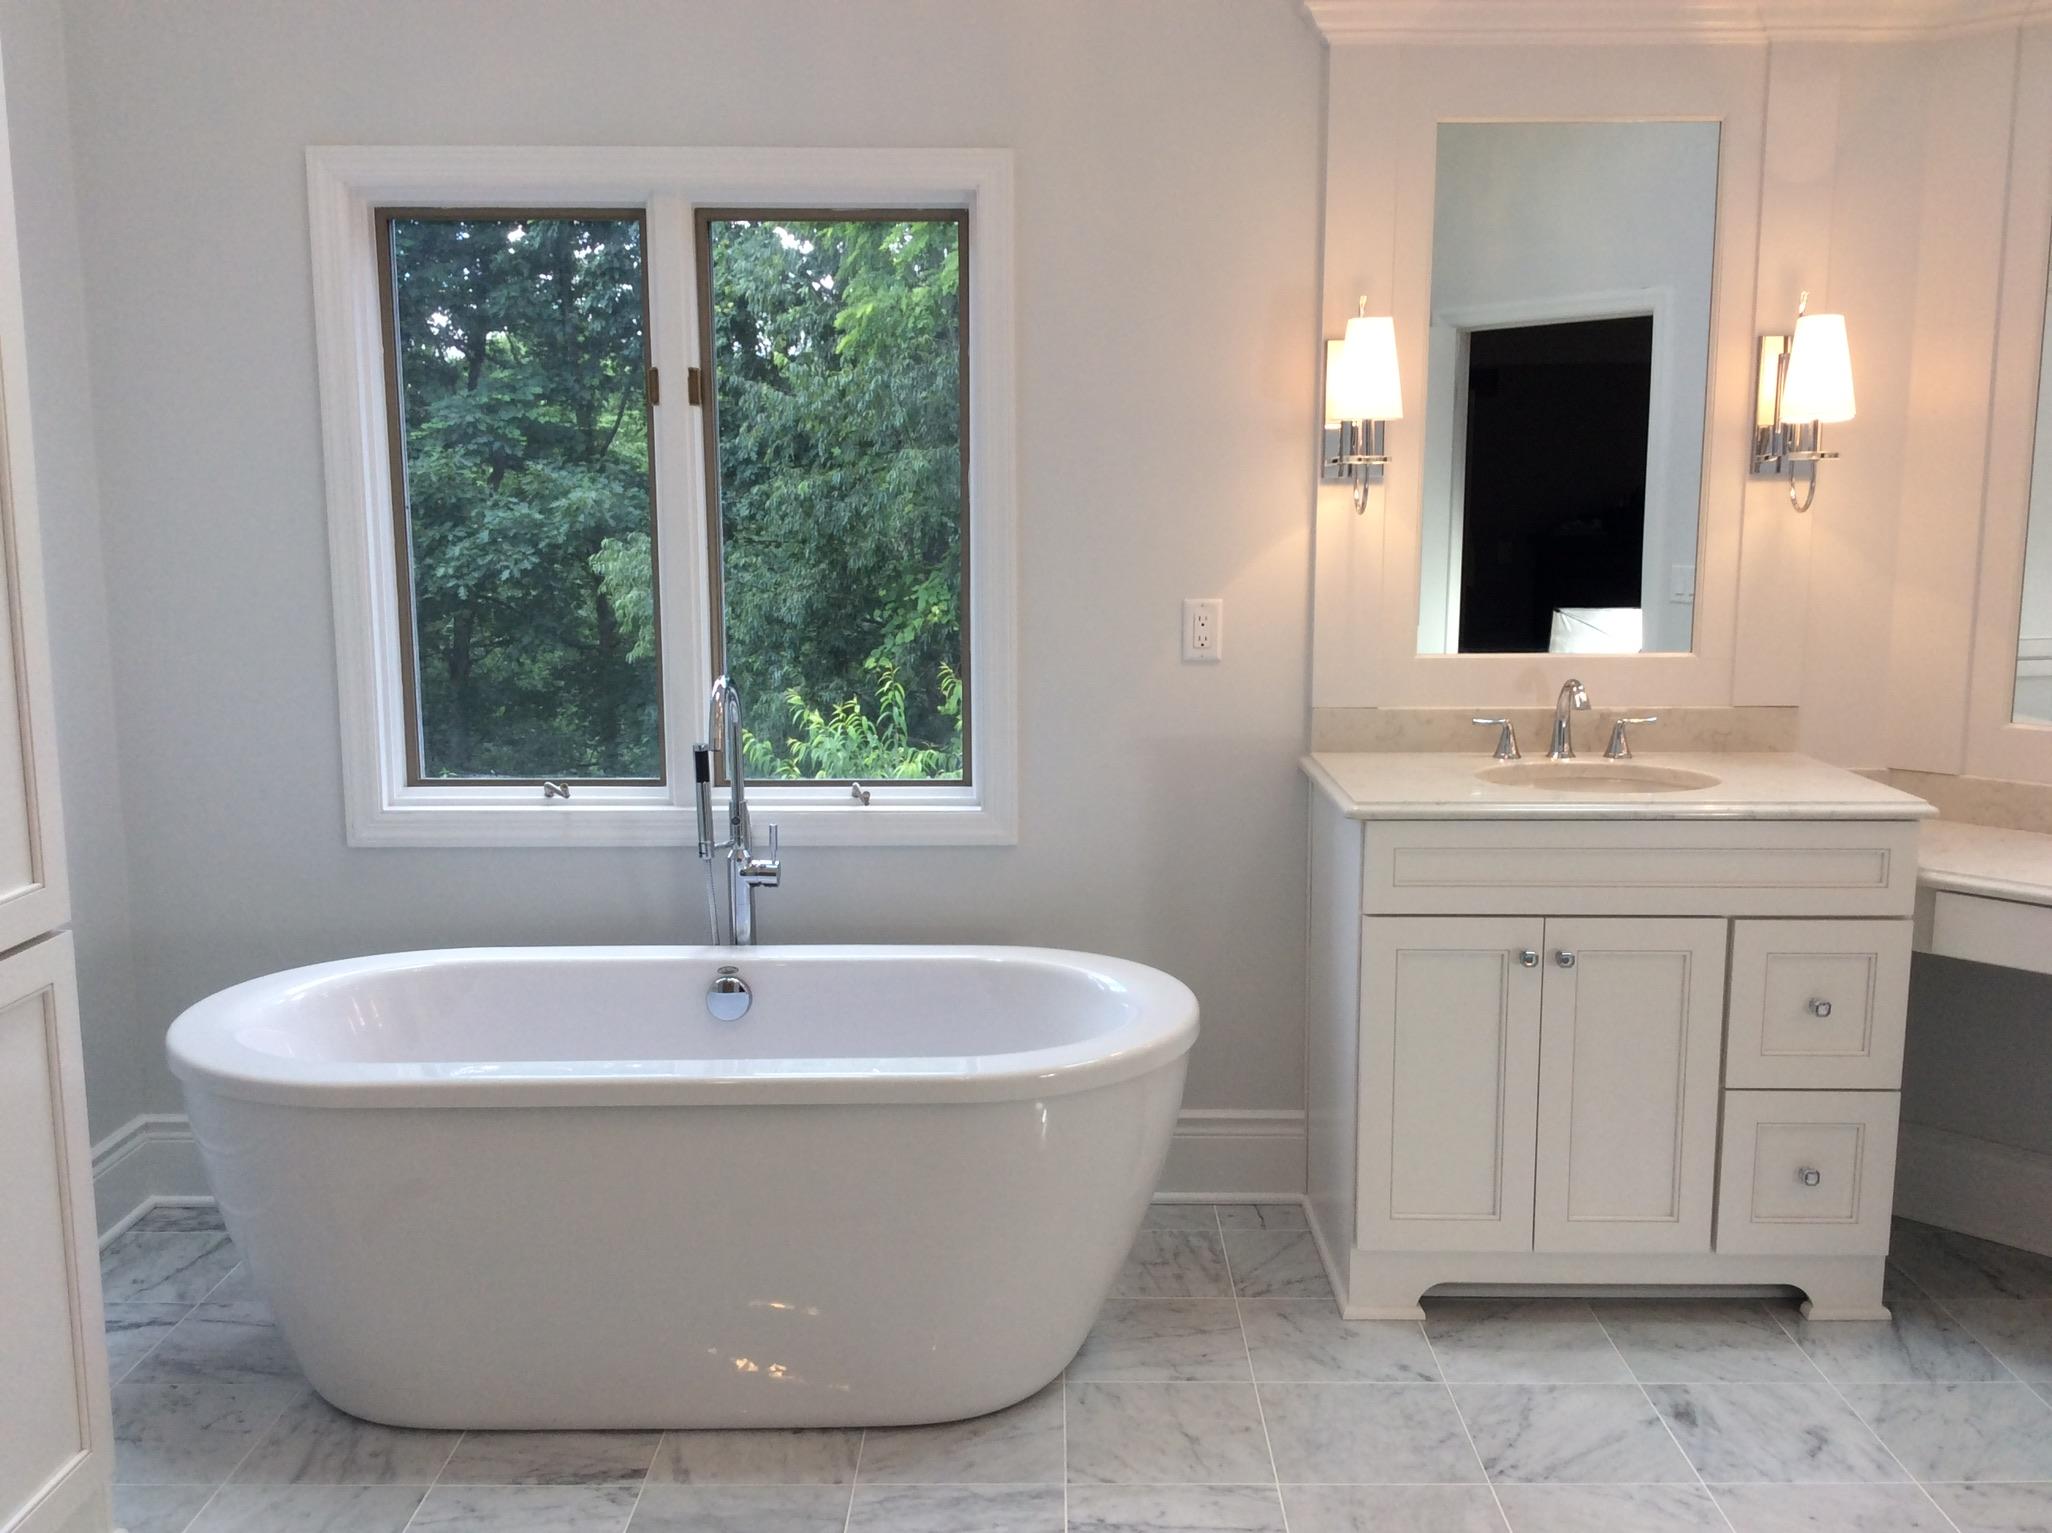 Clic Bathroom With Modern Touch